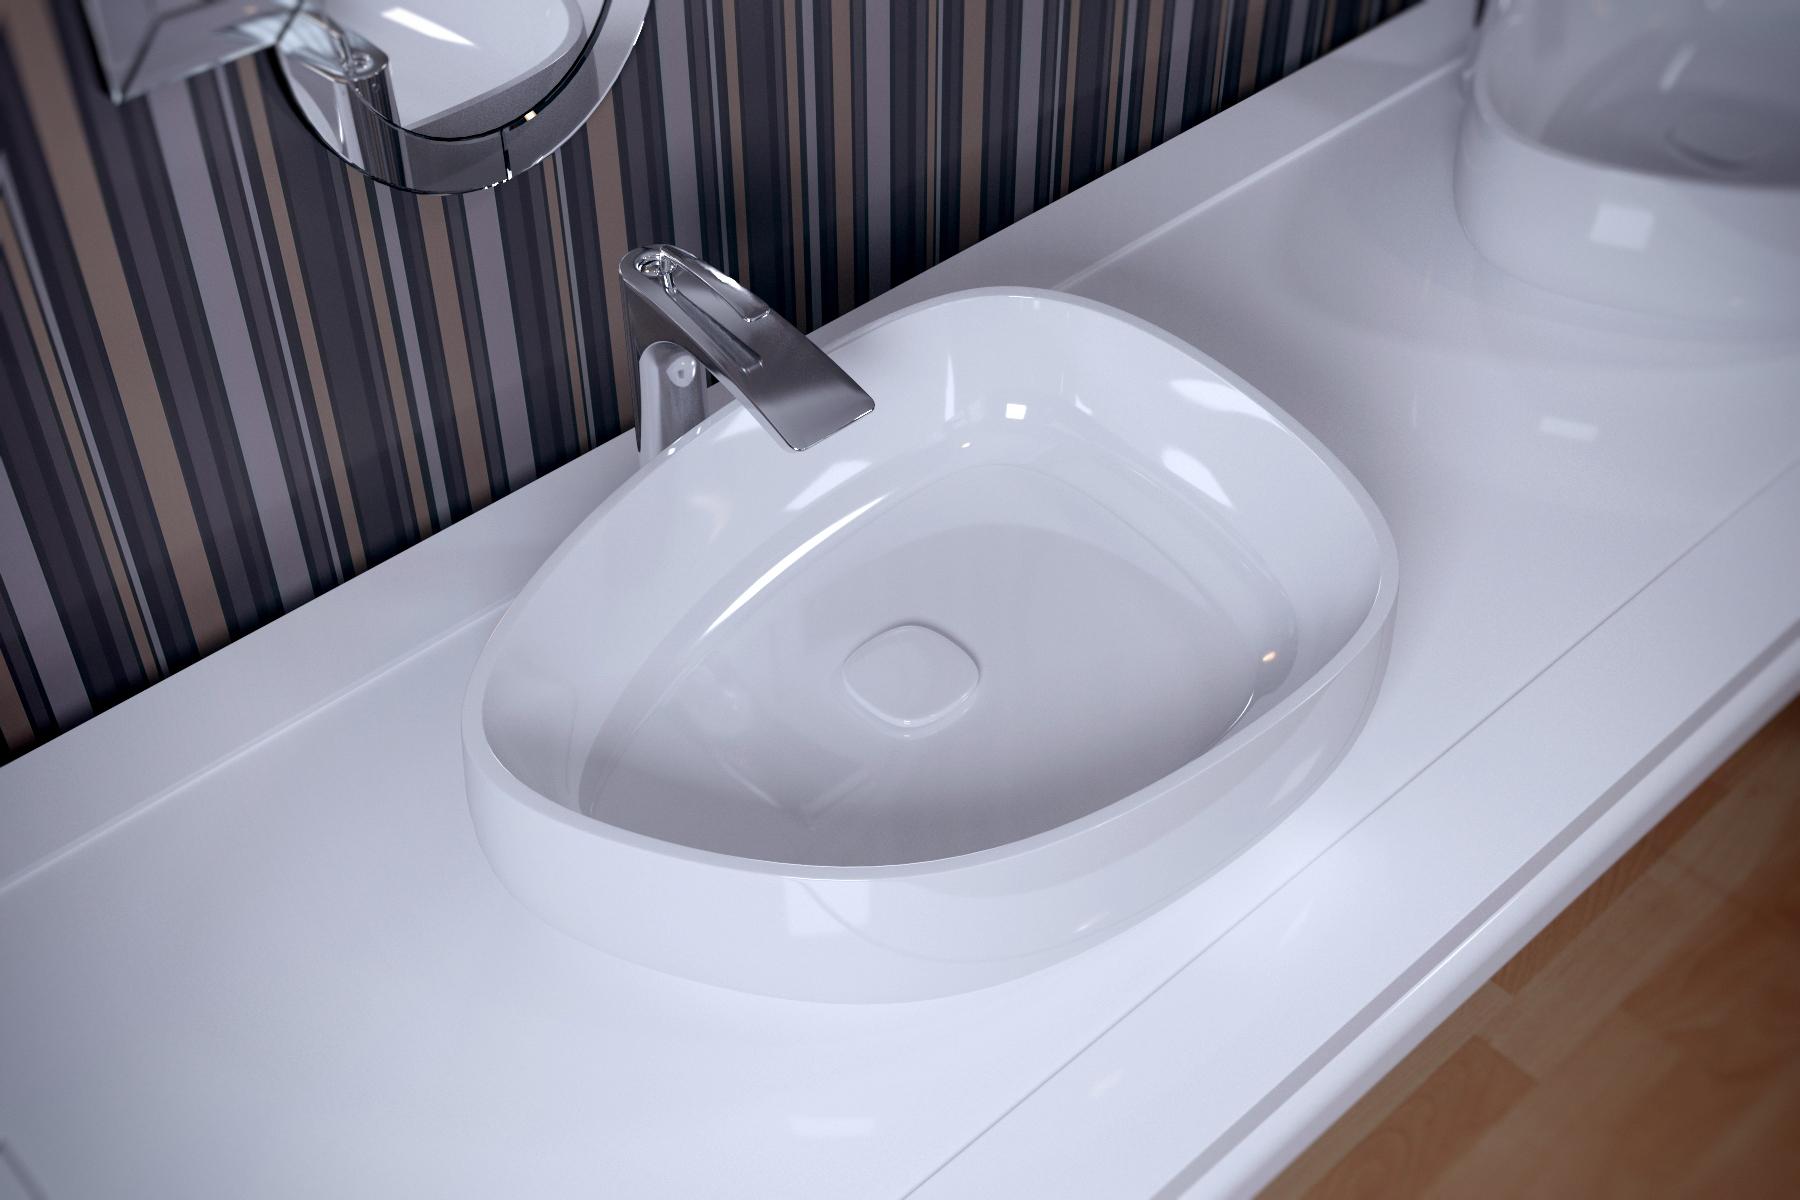 Metamorfosi Wht Shapeless Ceramic Bathroom Vessel Sink (2)